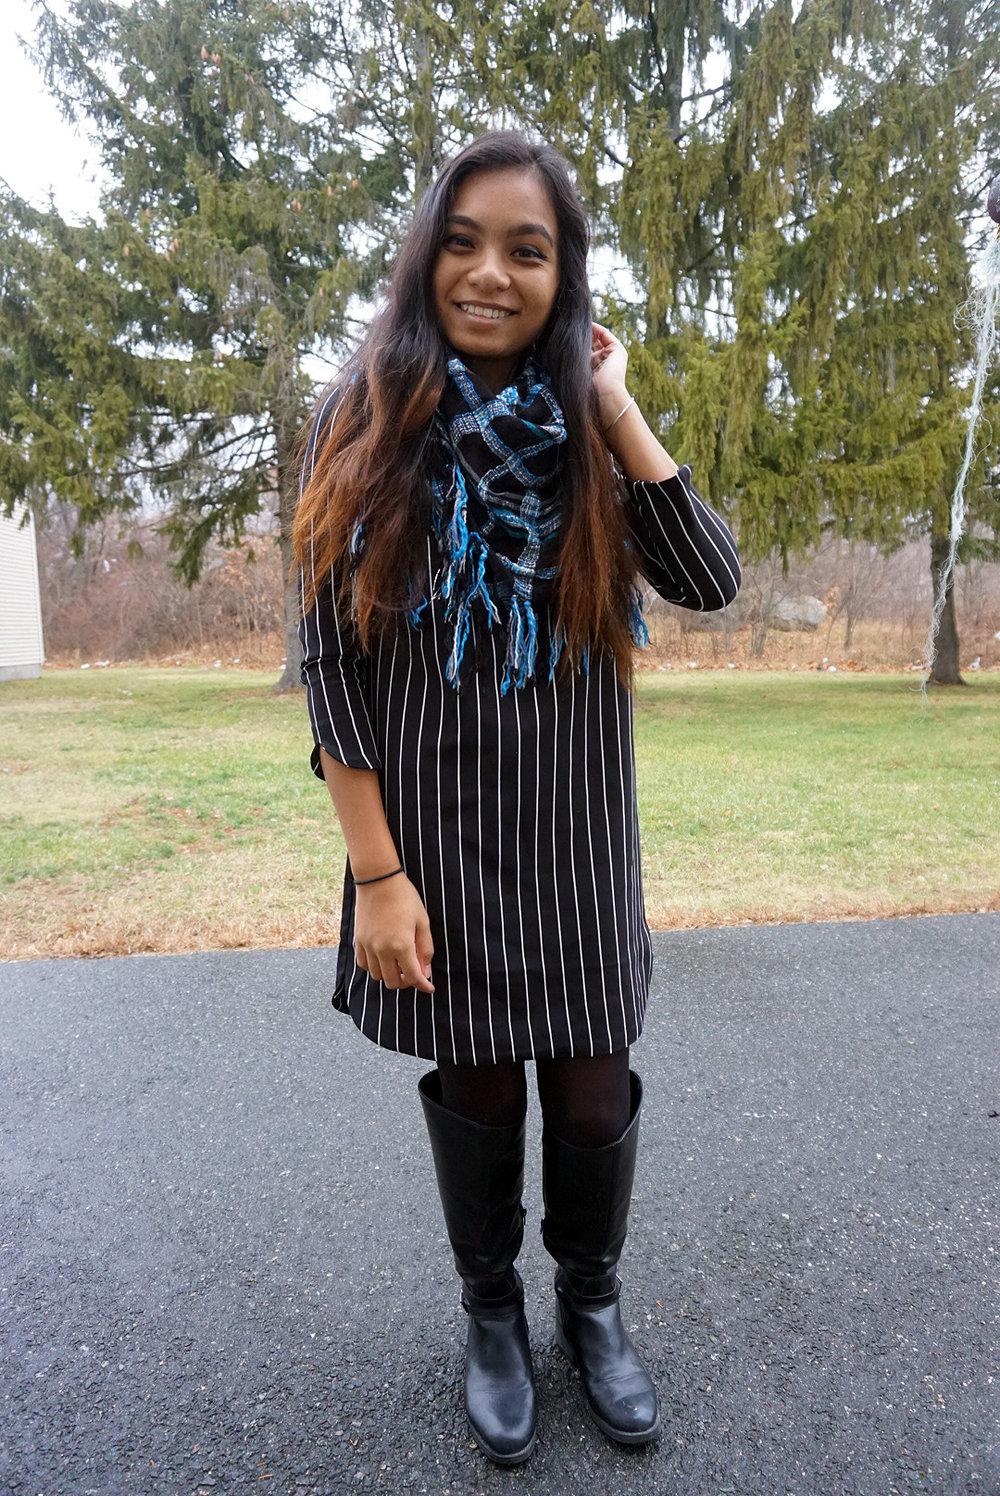 Black-White-Striped-Dress-Blogger-Style-LINDATENCHITRAN-20-1080x1616.jpg